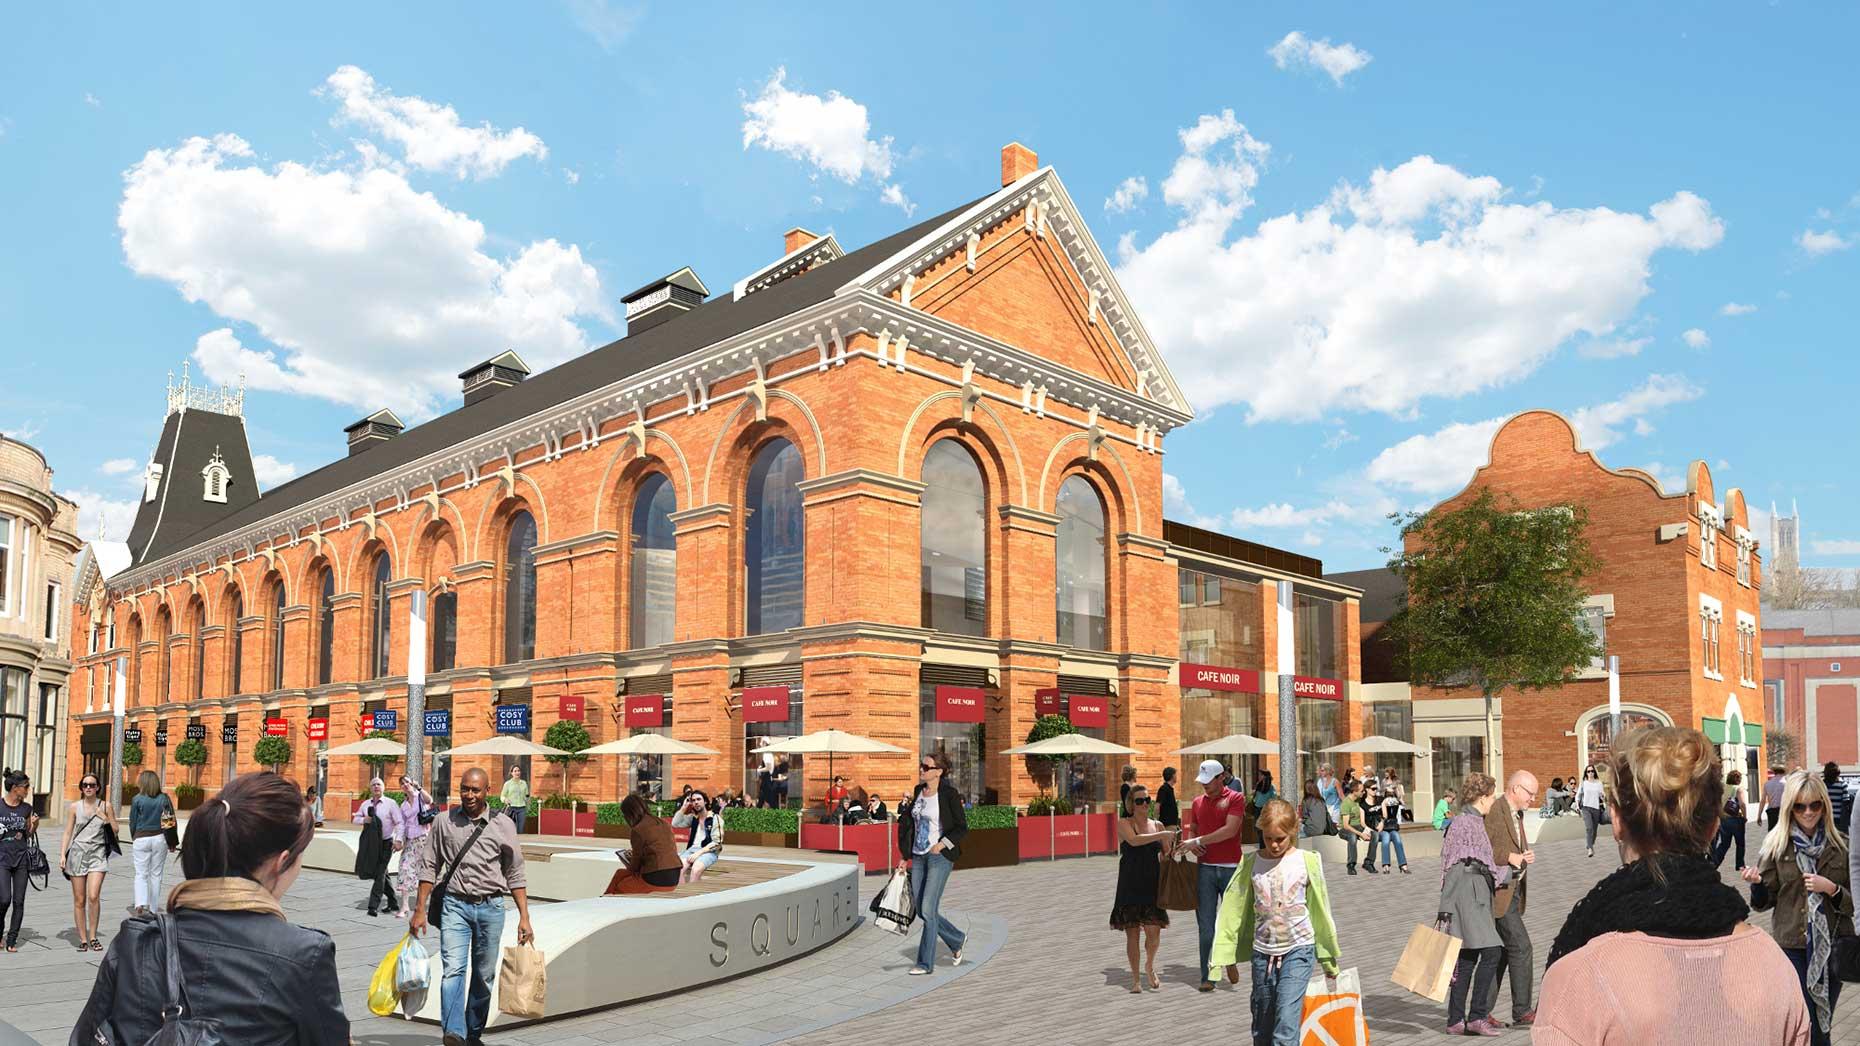 Artist impression of the new look Cornhill Quarter